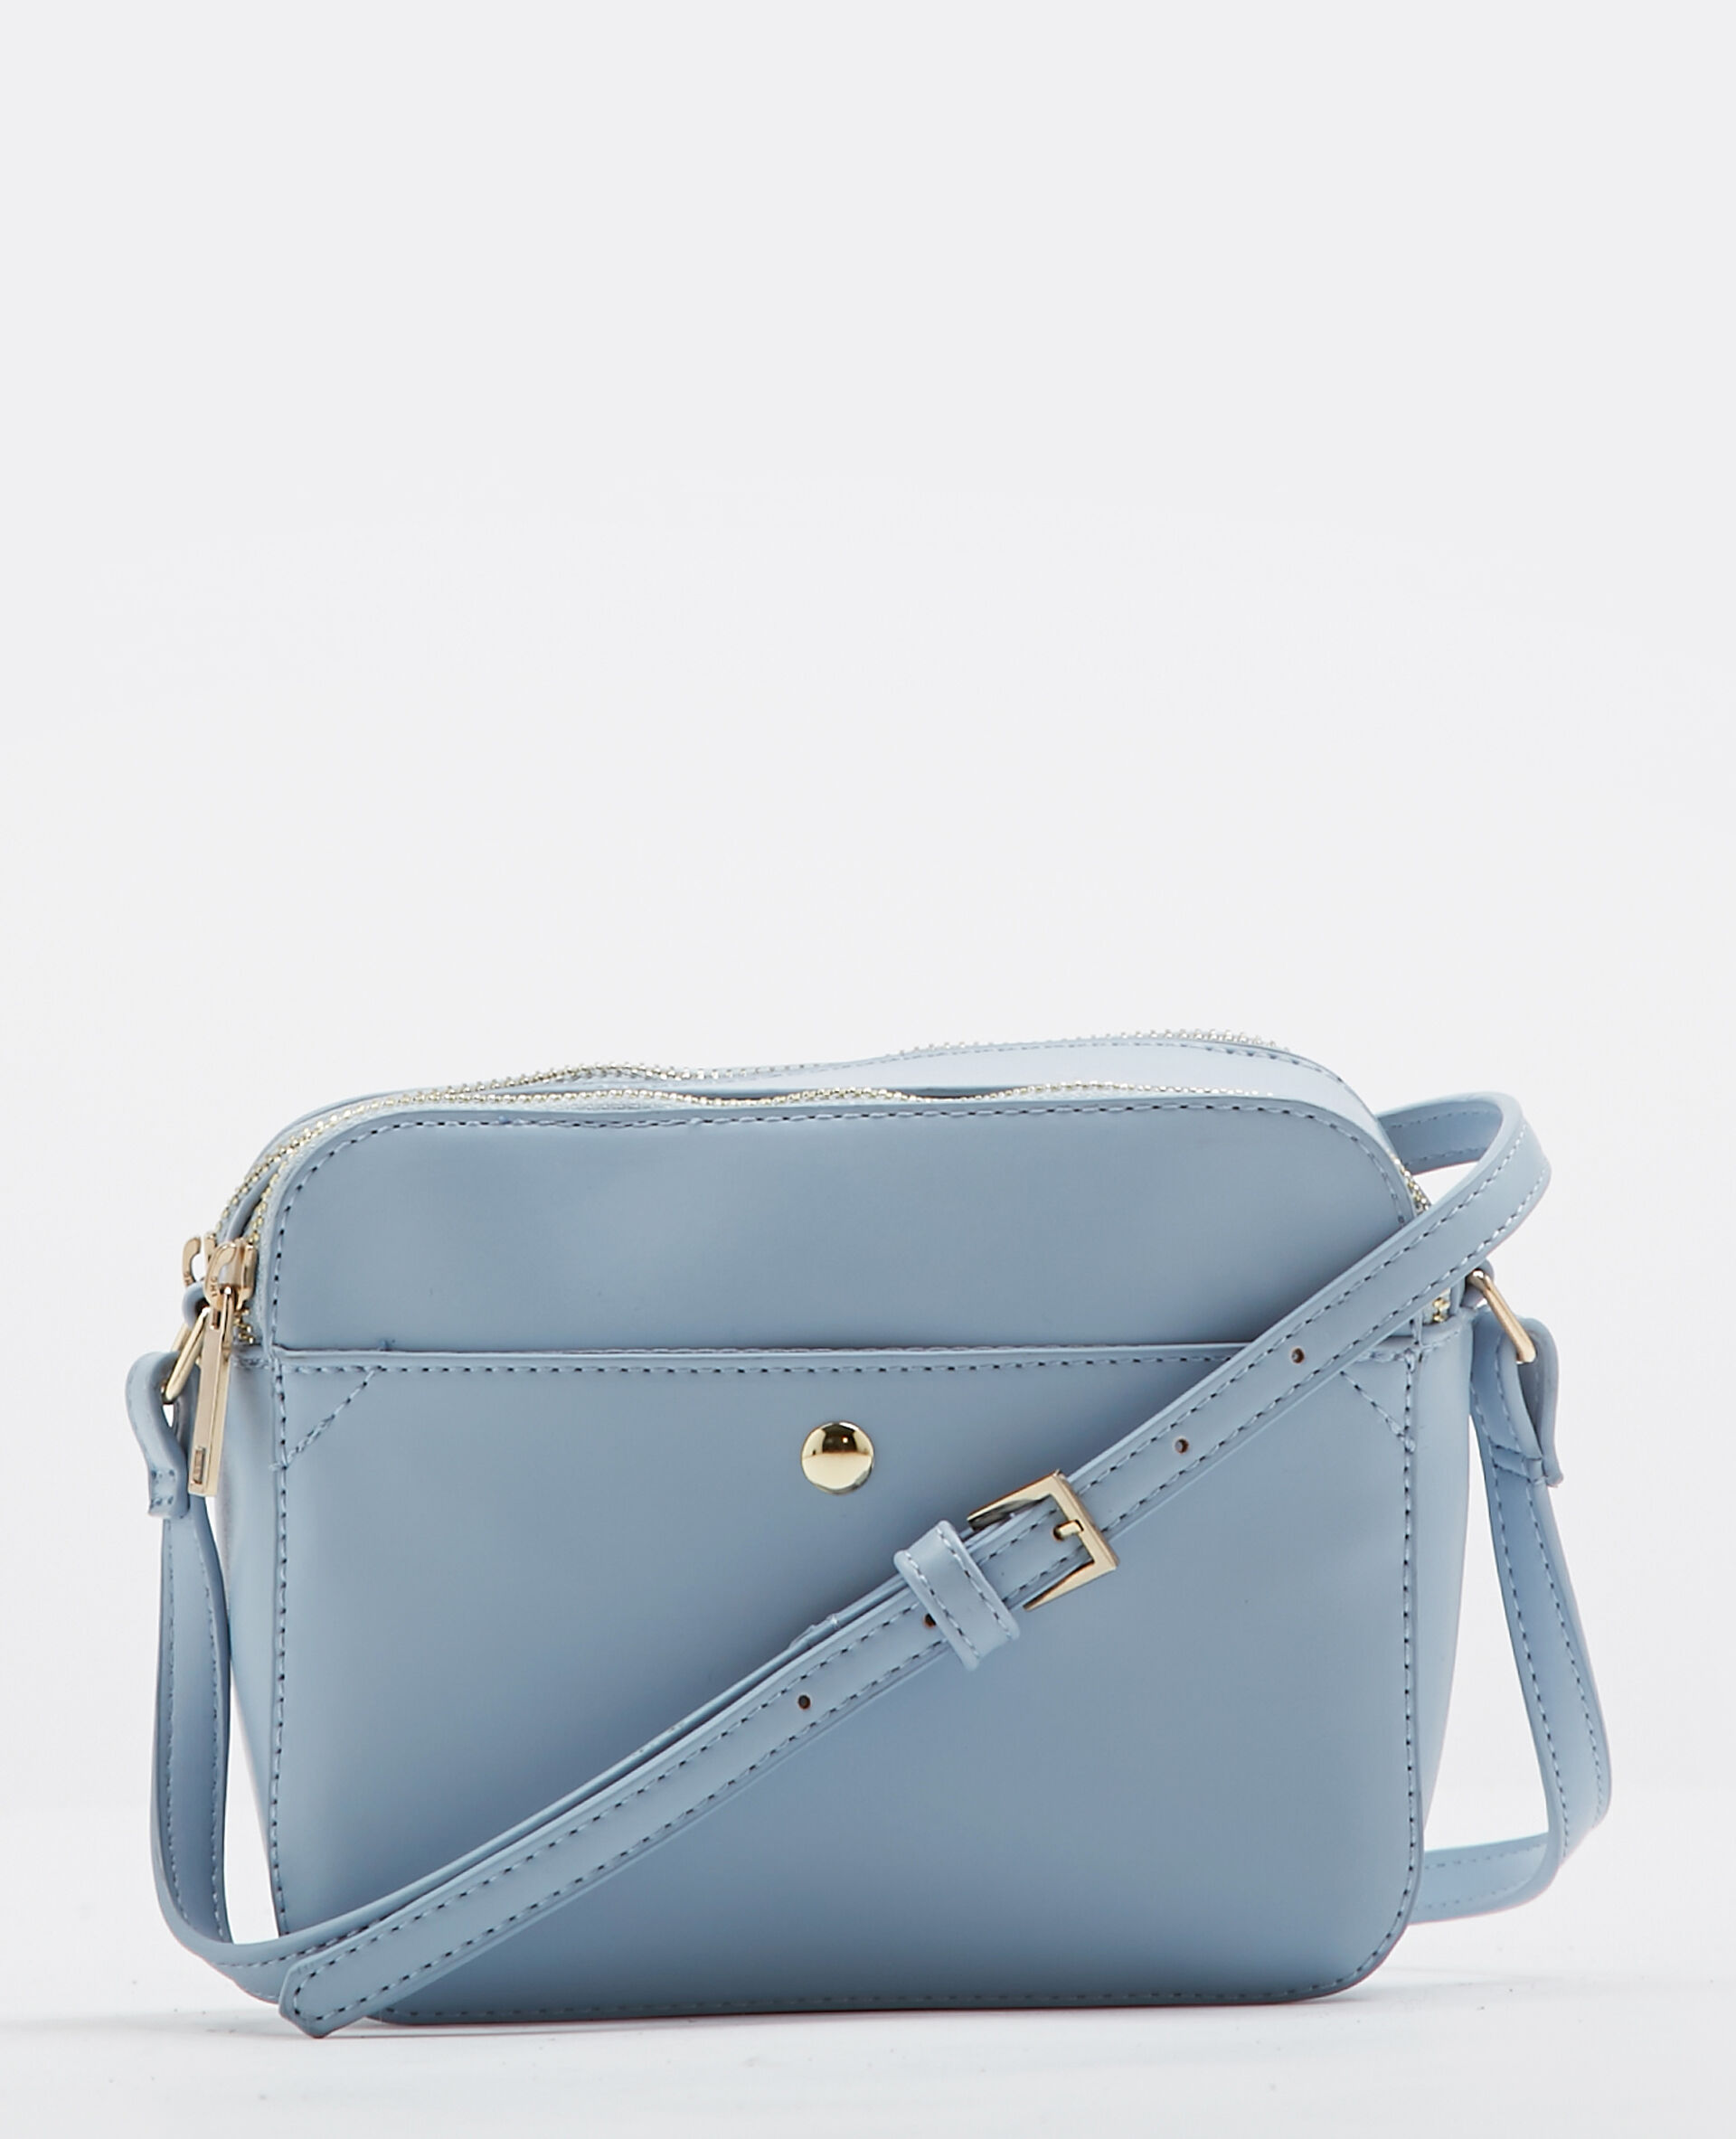 Petit sac boxy bleu